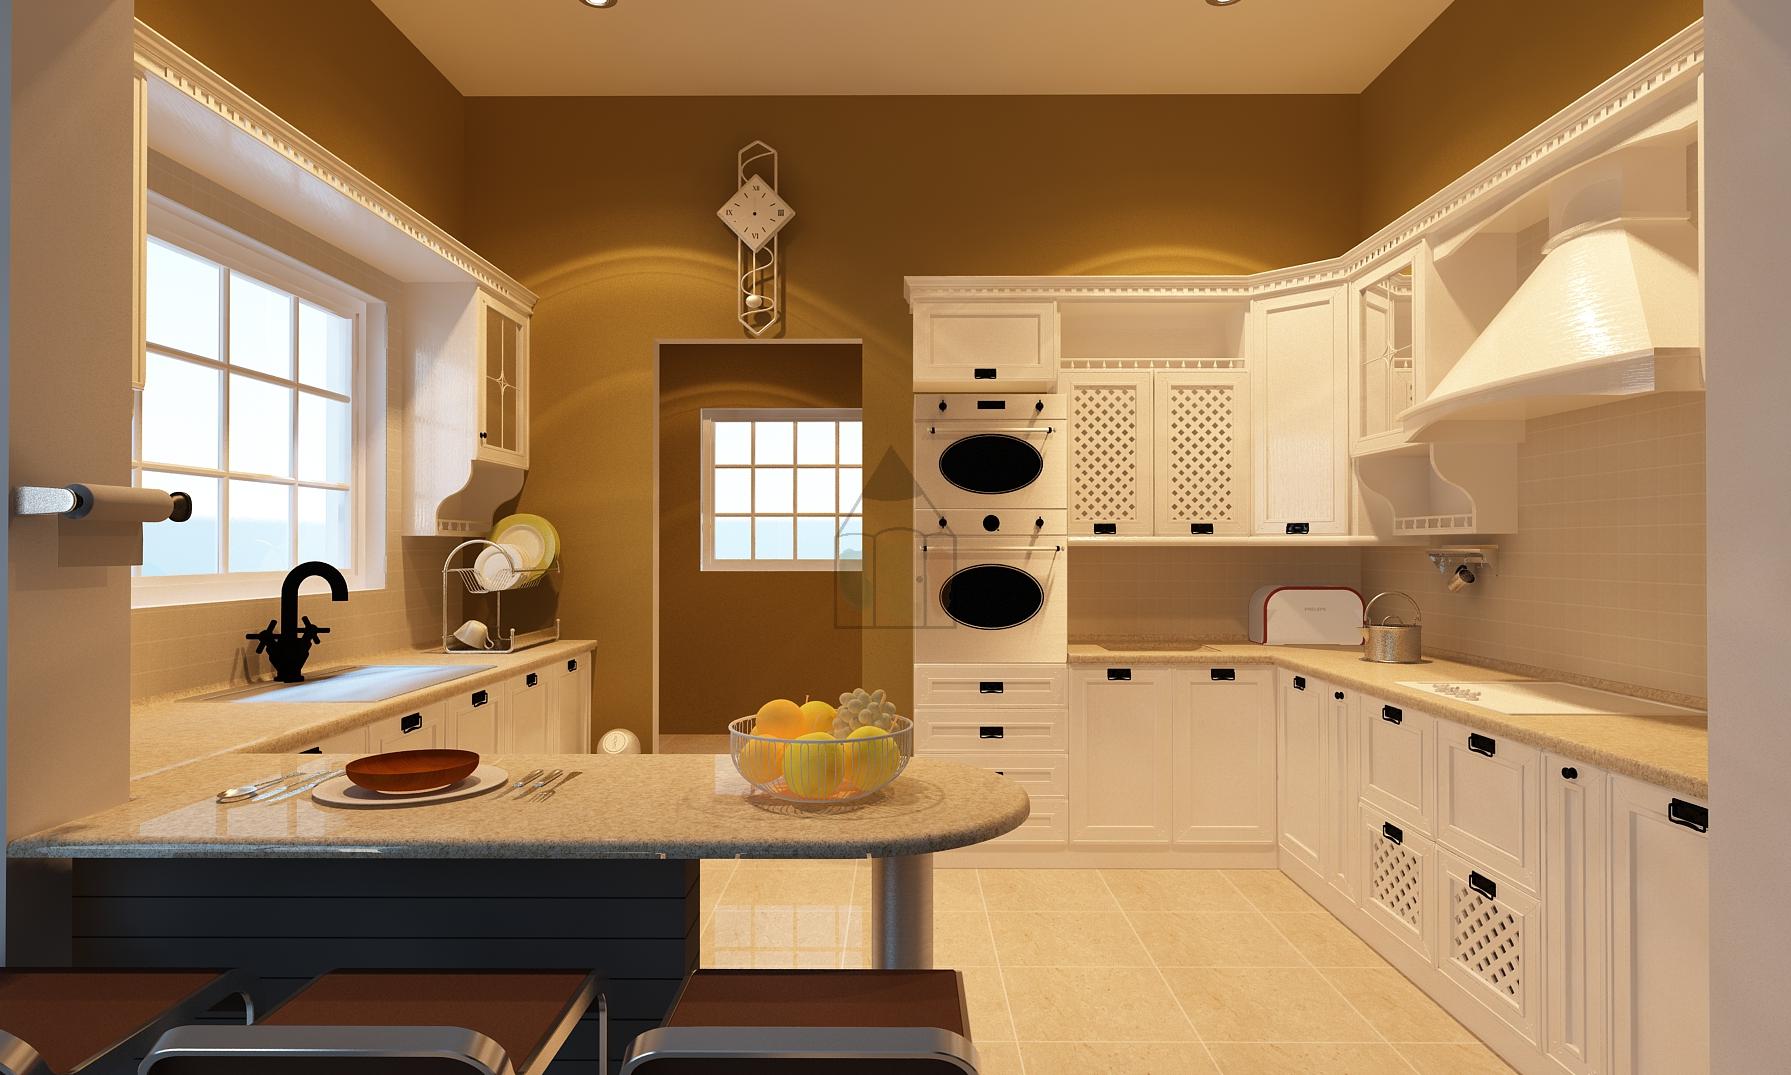 Pakistani Kitchen Cabinet Design Images